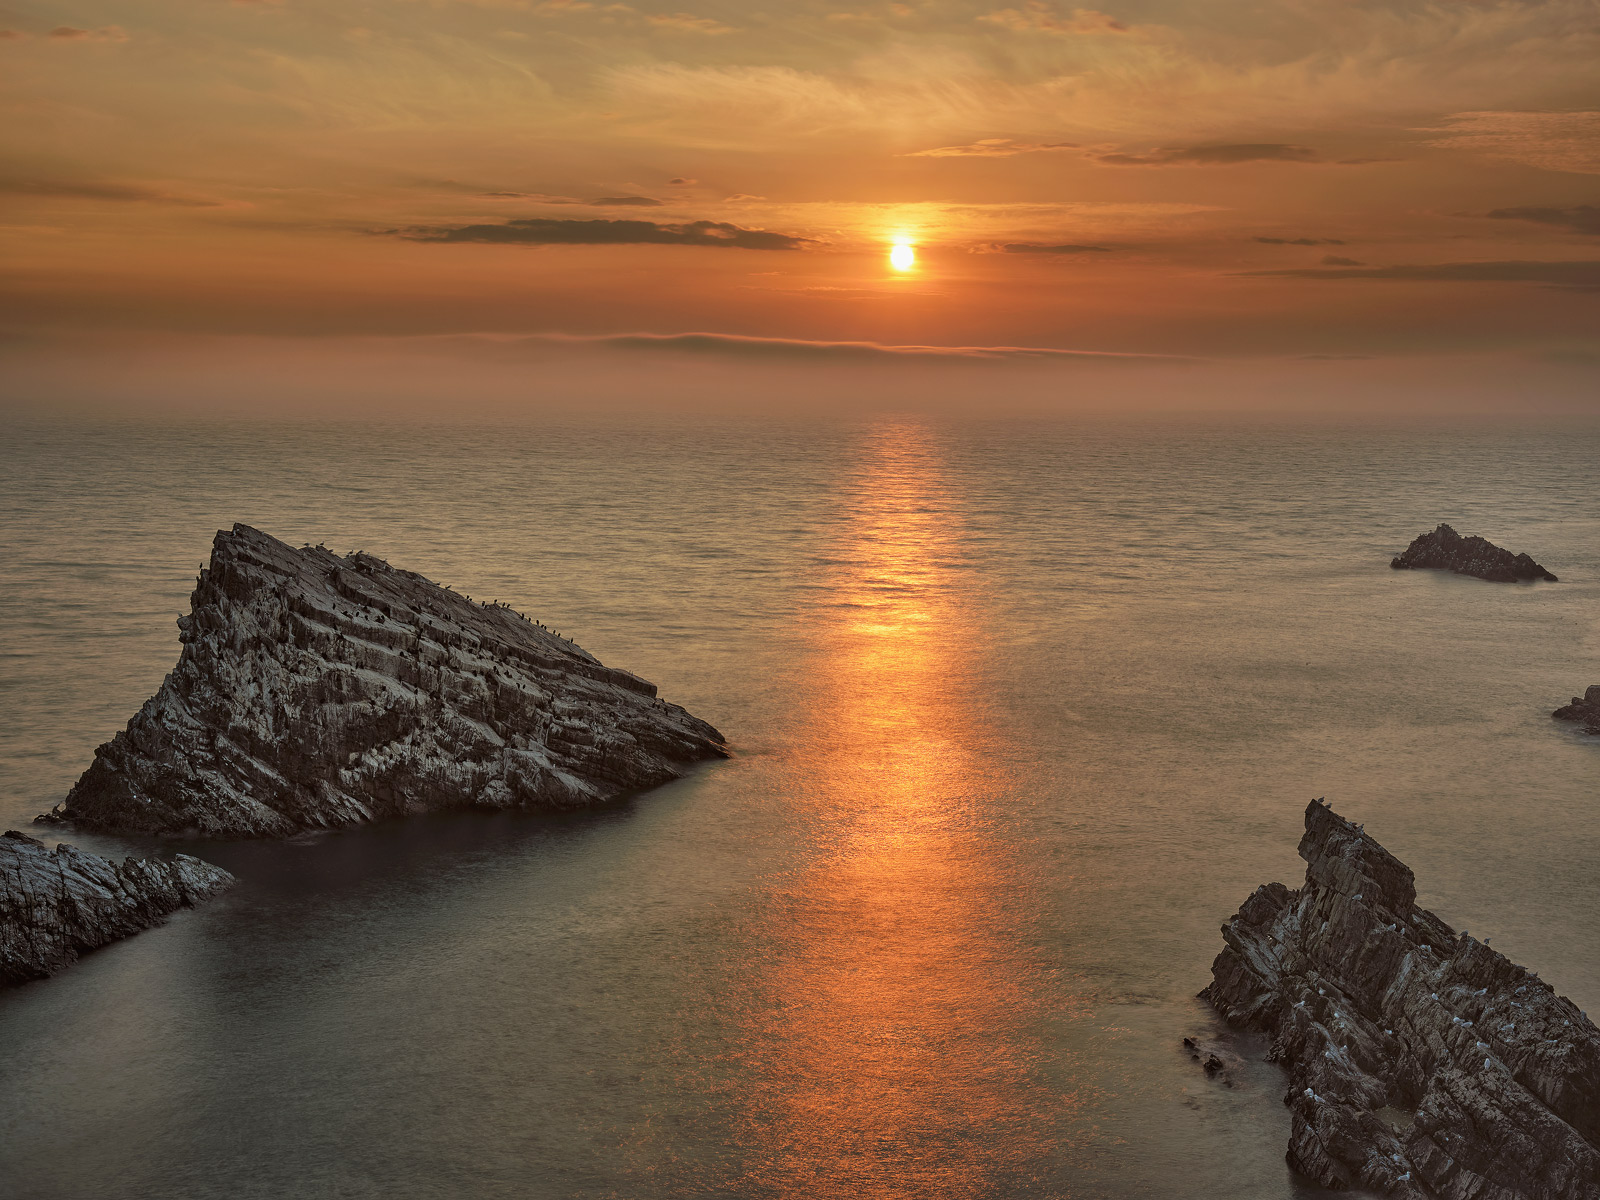 Gold Standard Portknockie, Portknockie, Moray, Scotland, sunrise, reflective, shining, gold, path, roosting, sea birds , photo